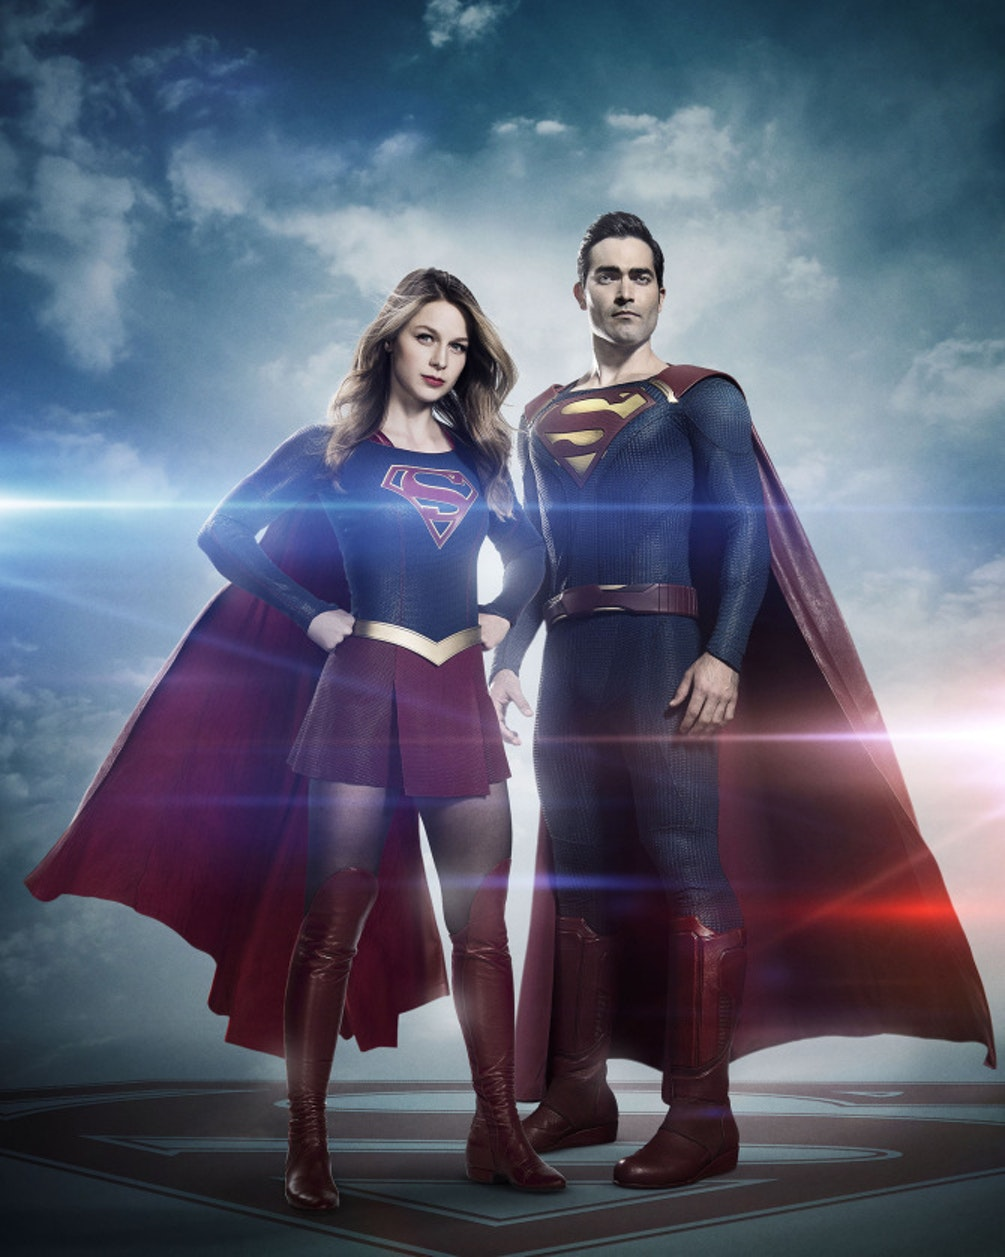 Melissa Benoist as Supergirl and Tyler Hoechlin as Superman in 'Supergirl' Season 2.